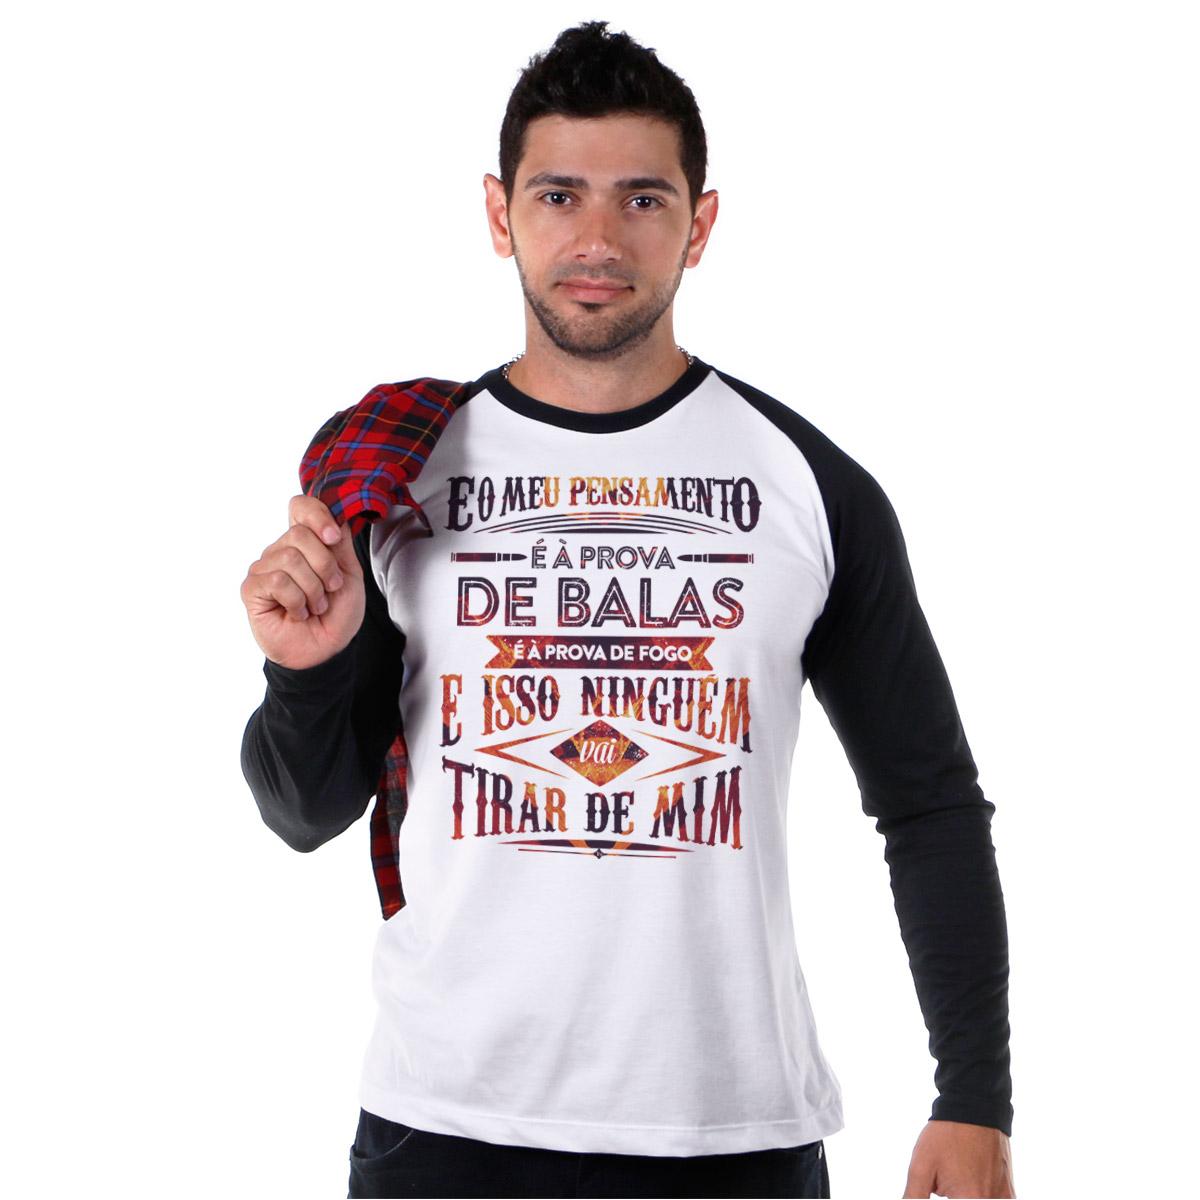 Camiseta Manga Longa Raglan Masculina Fresno Pensamento à Prova de Balas Type